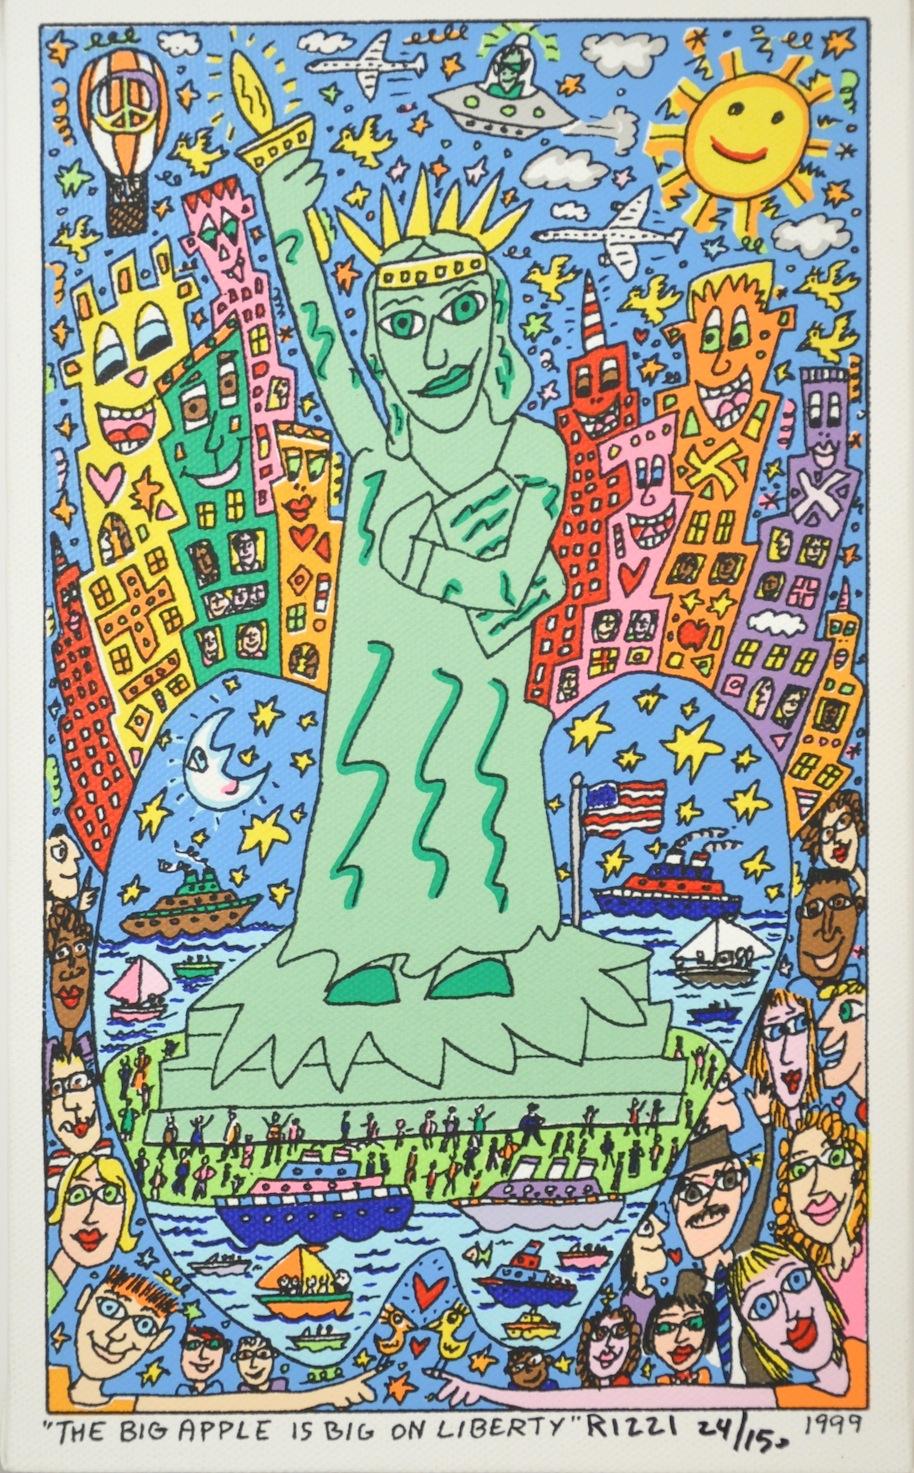 The Big Apple is Big on Liberty